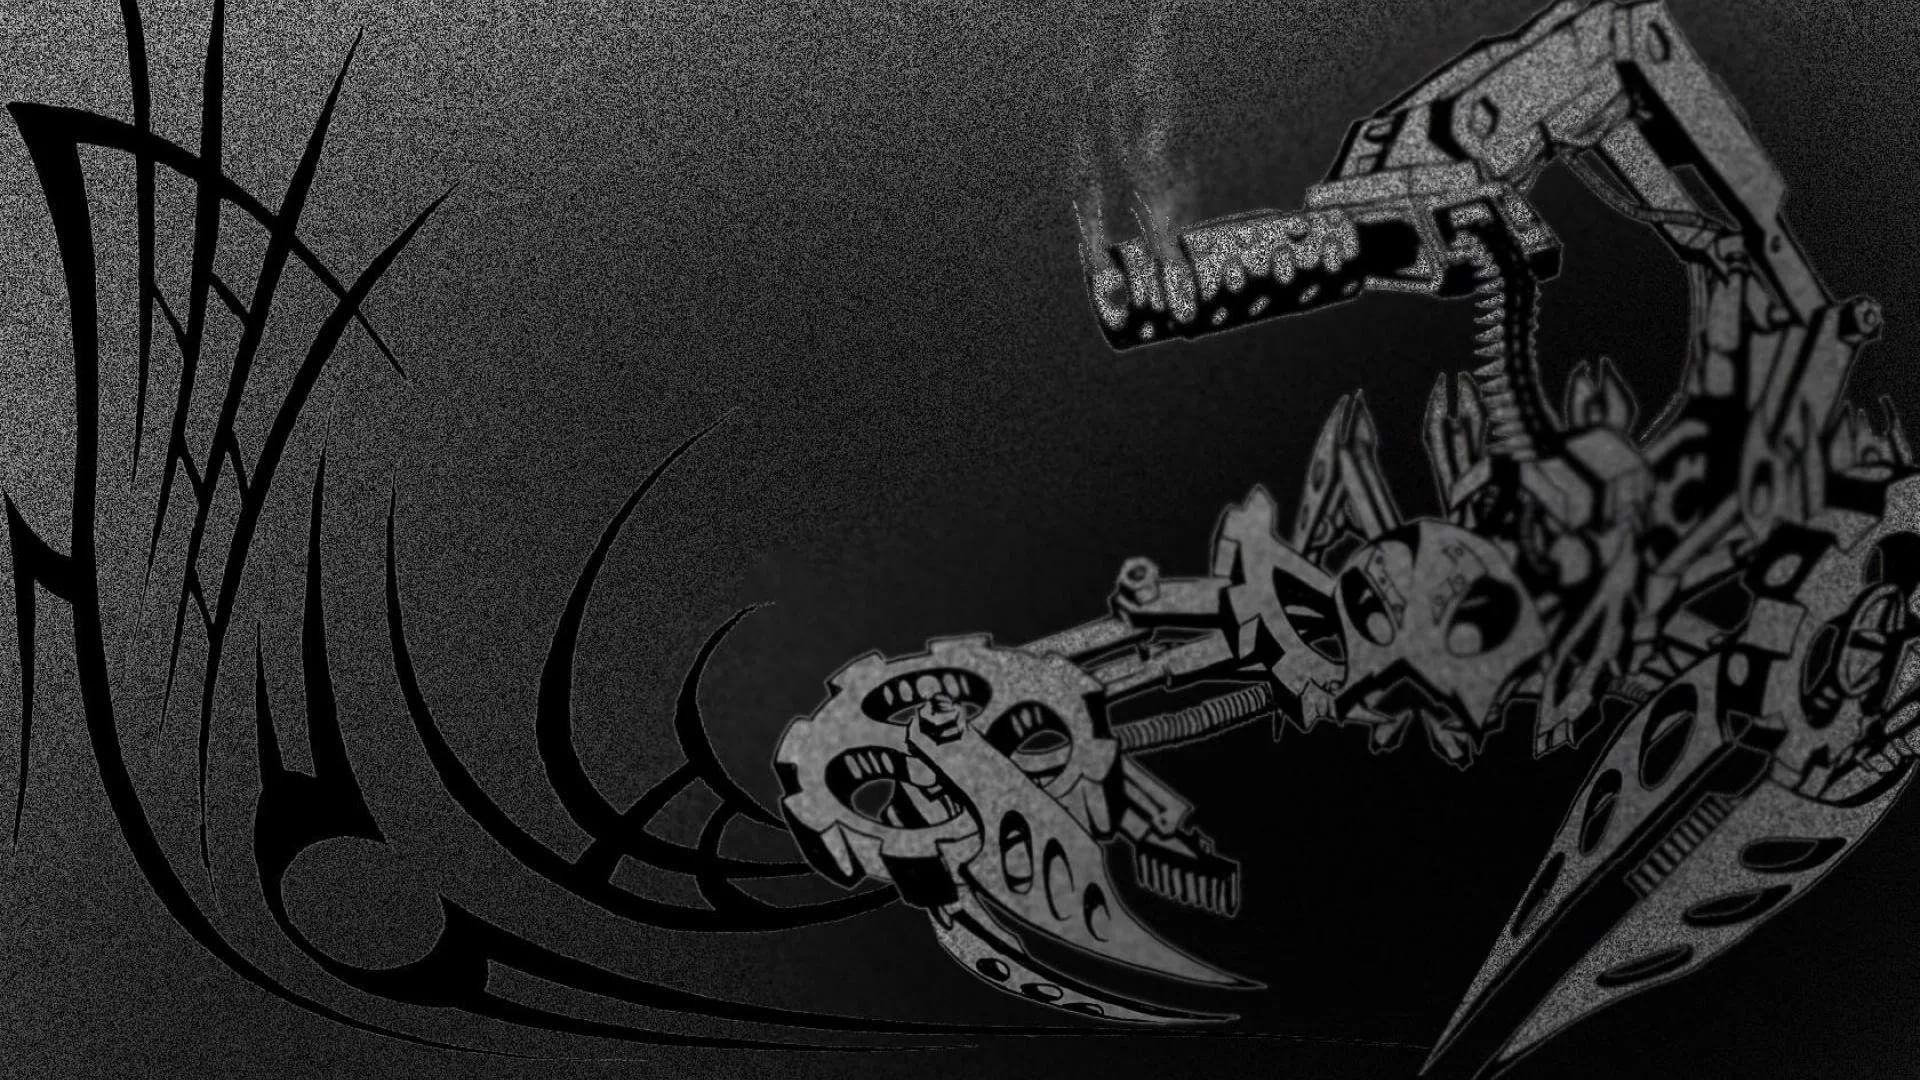 Scorpio HD 1080 wallpaper